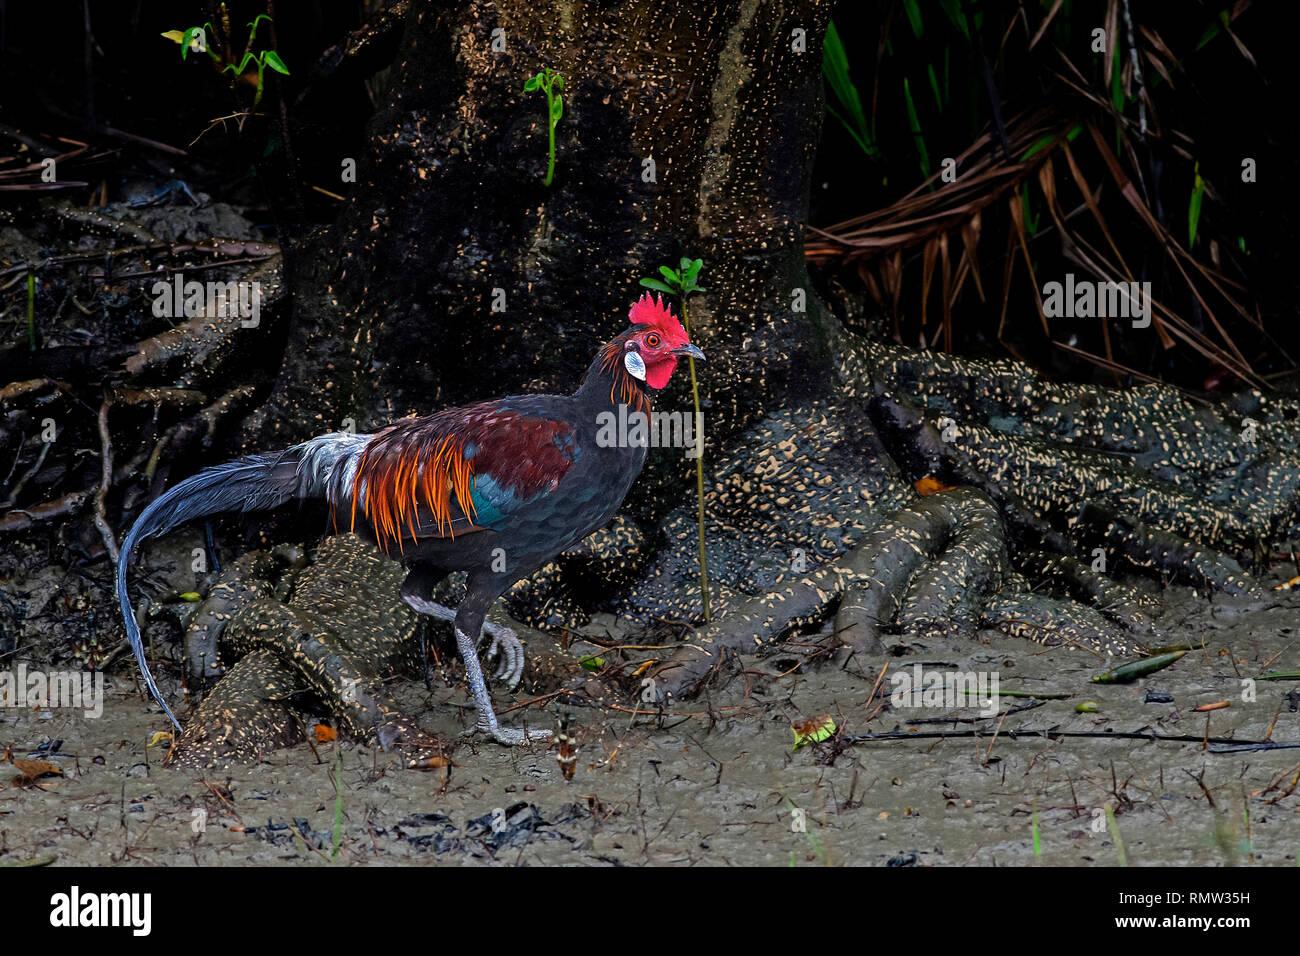 red junglefowl, Gallus gallus, male, foraging on mudflat, Sundarban Tiger Reserve, West Bengal, India - Stock Image